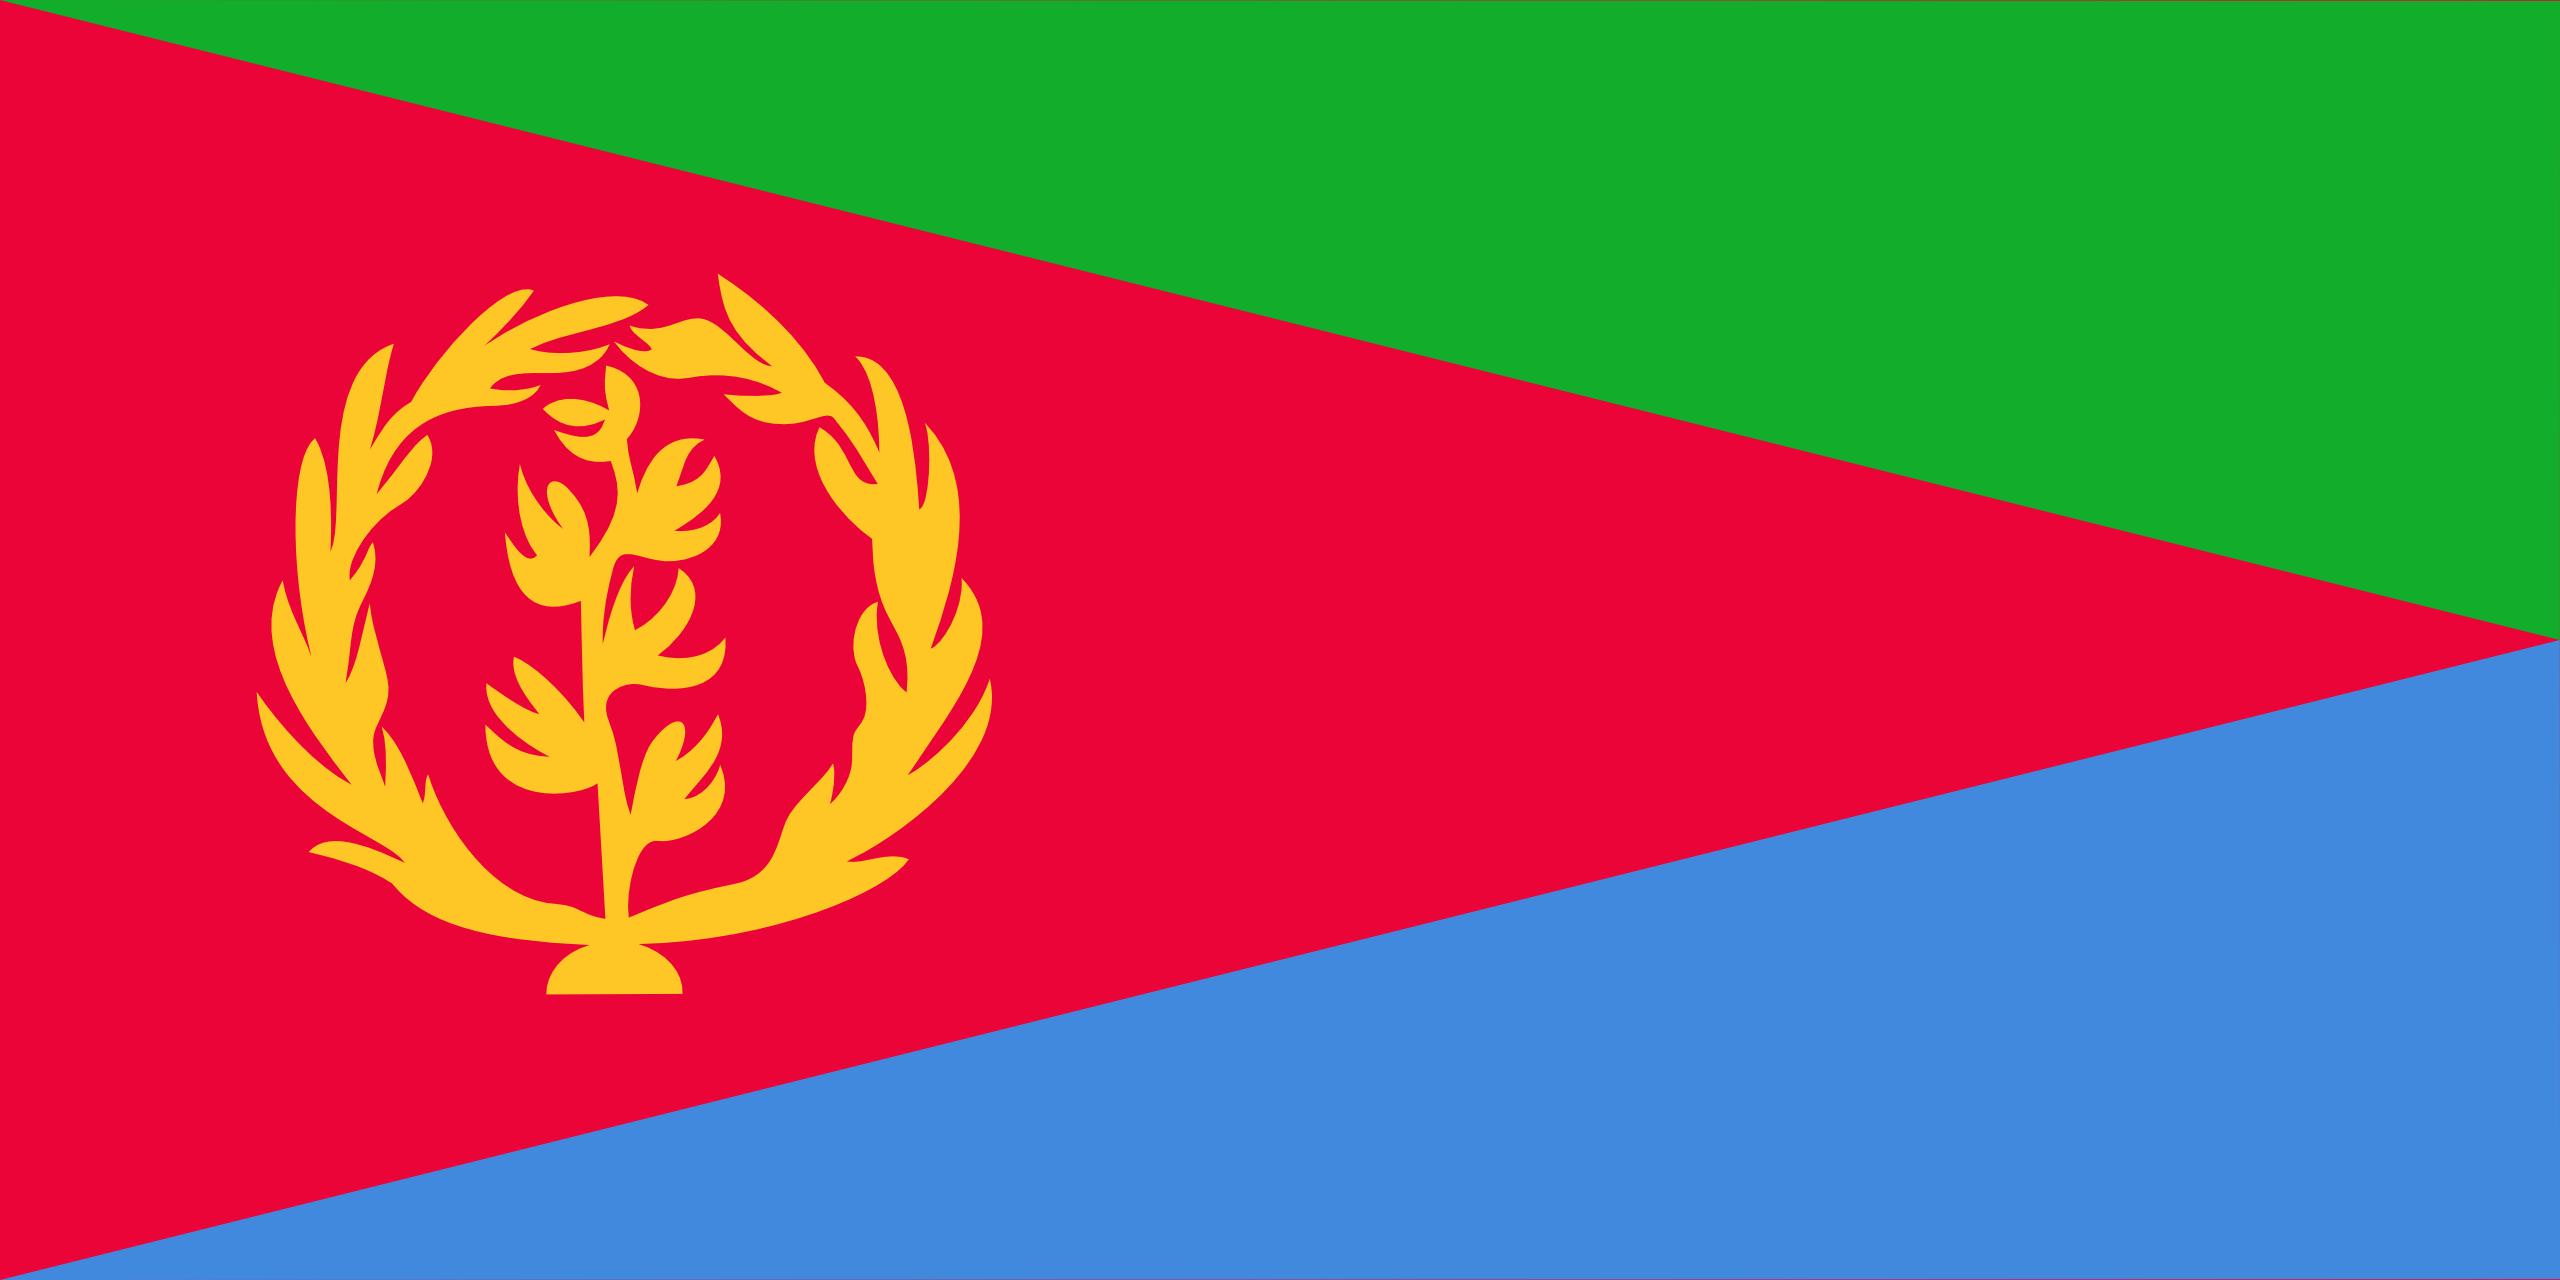 eritrea, देश, emblema, लोग�प्रतीकbolo - HD वॉलपेपर - प्रोफेसर-falken.com